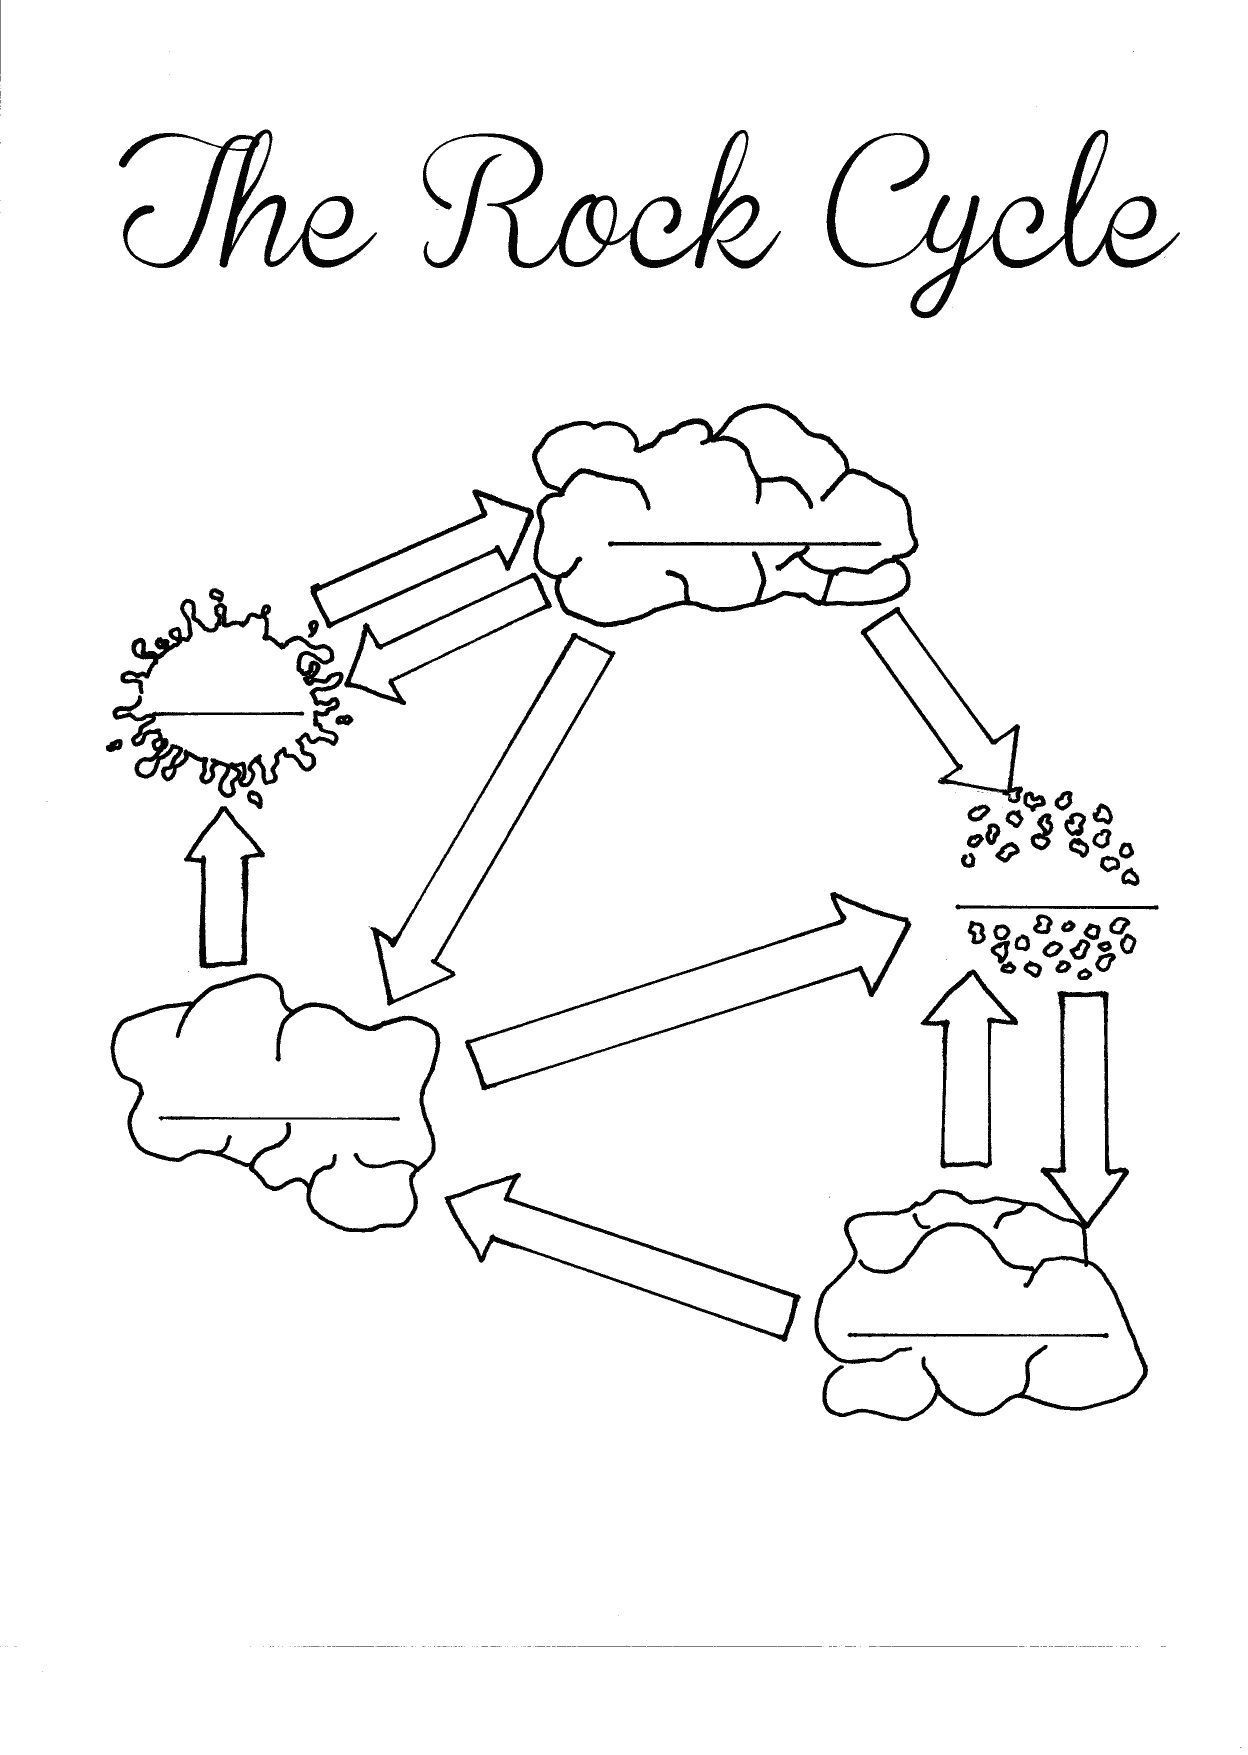 Nitrogen Cycle Worksheet Answer Key Nitrogen Cycle Worksheet High School Printable Worksheets